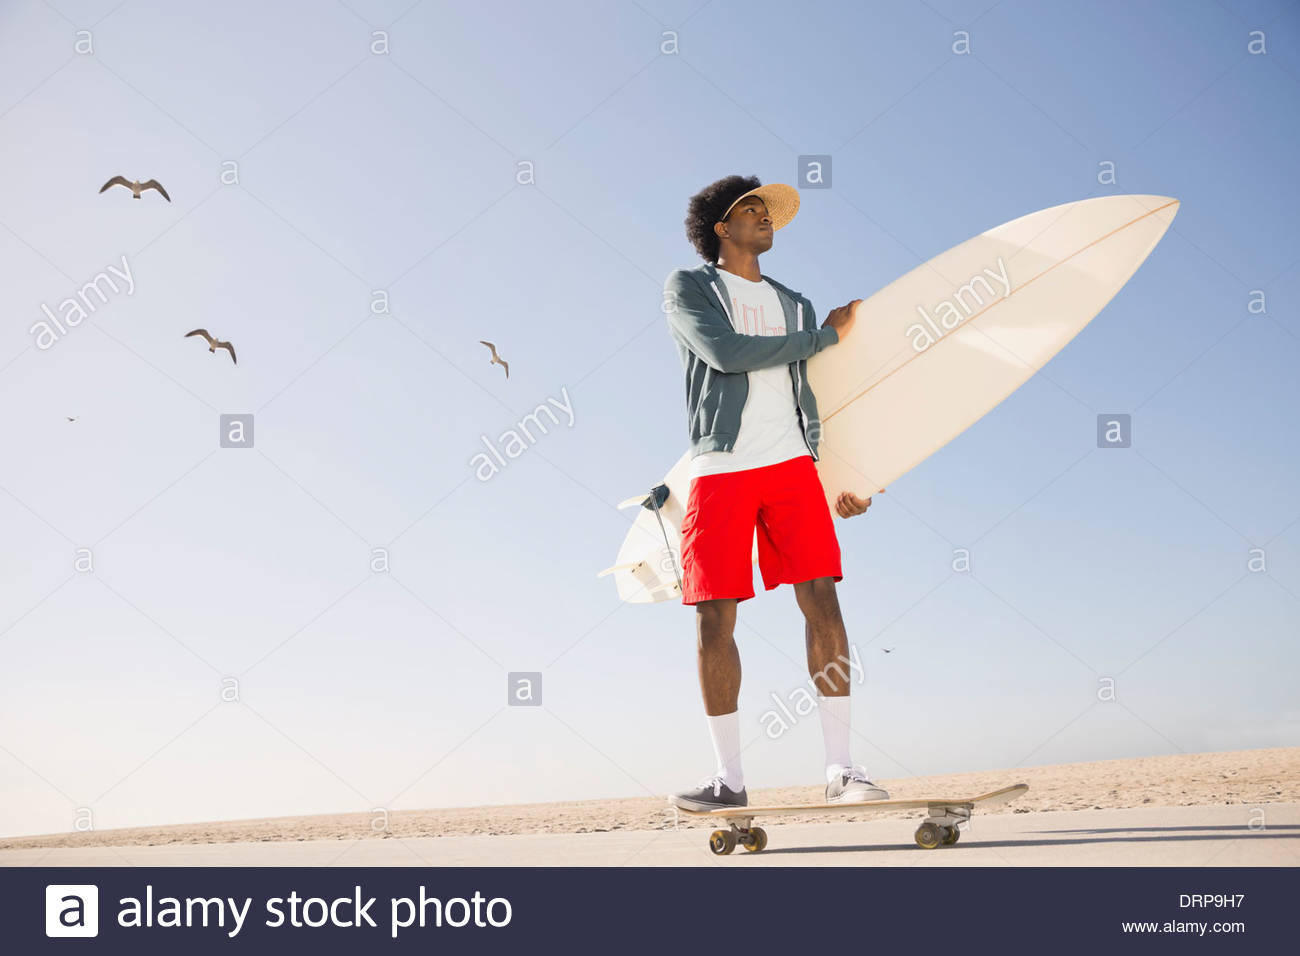 Männliche Surfer Skateboard am Strand Stockbild